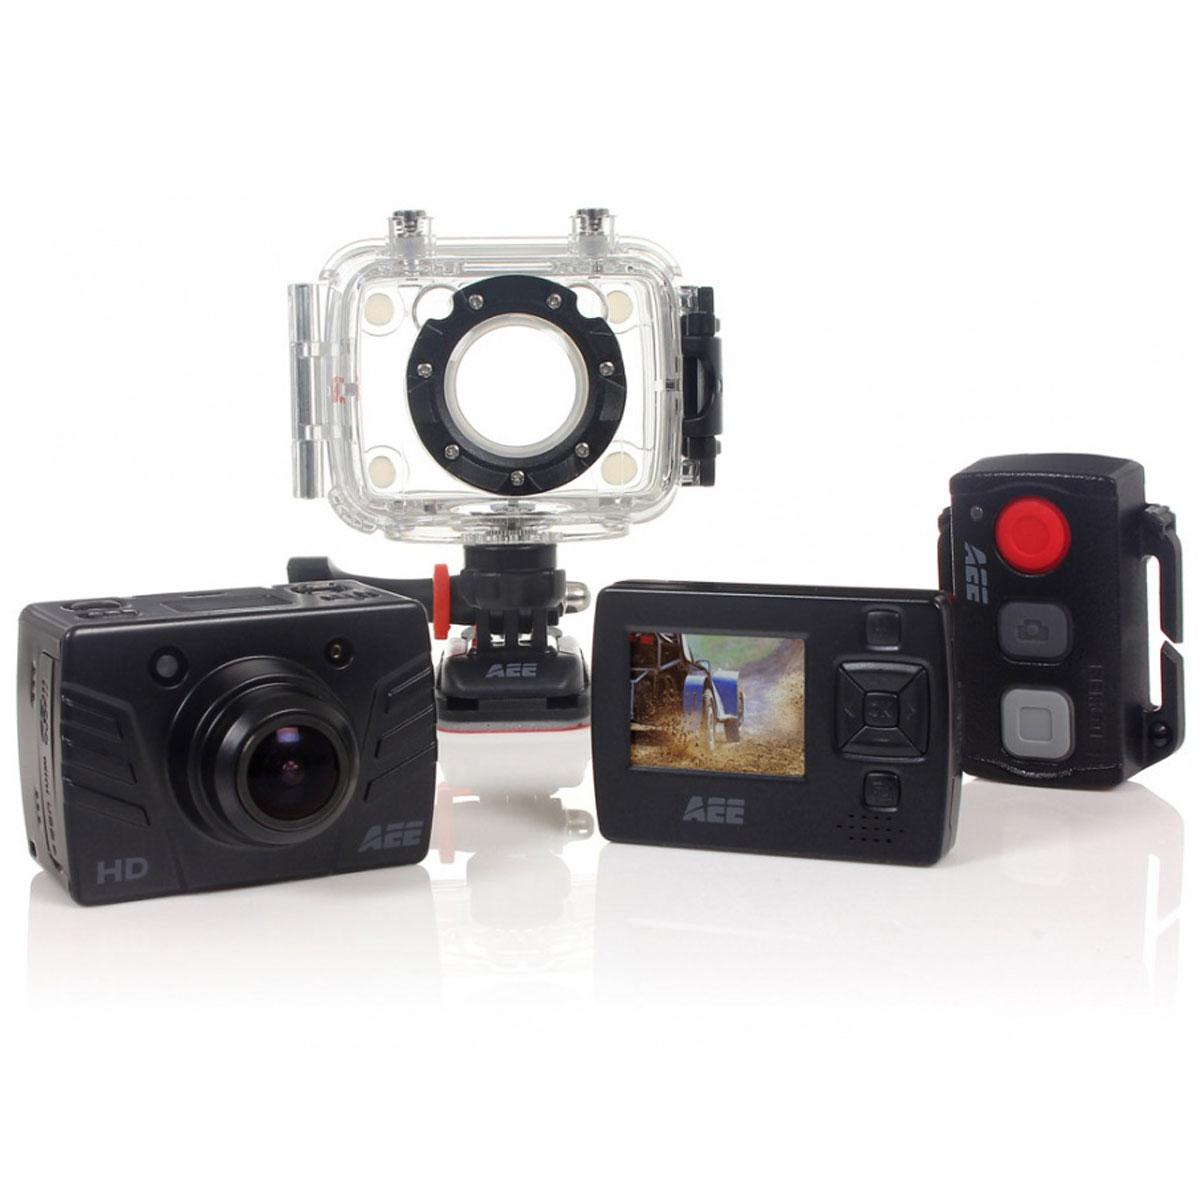 AEE S60 Magicam экшн-камера